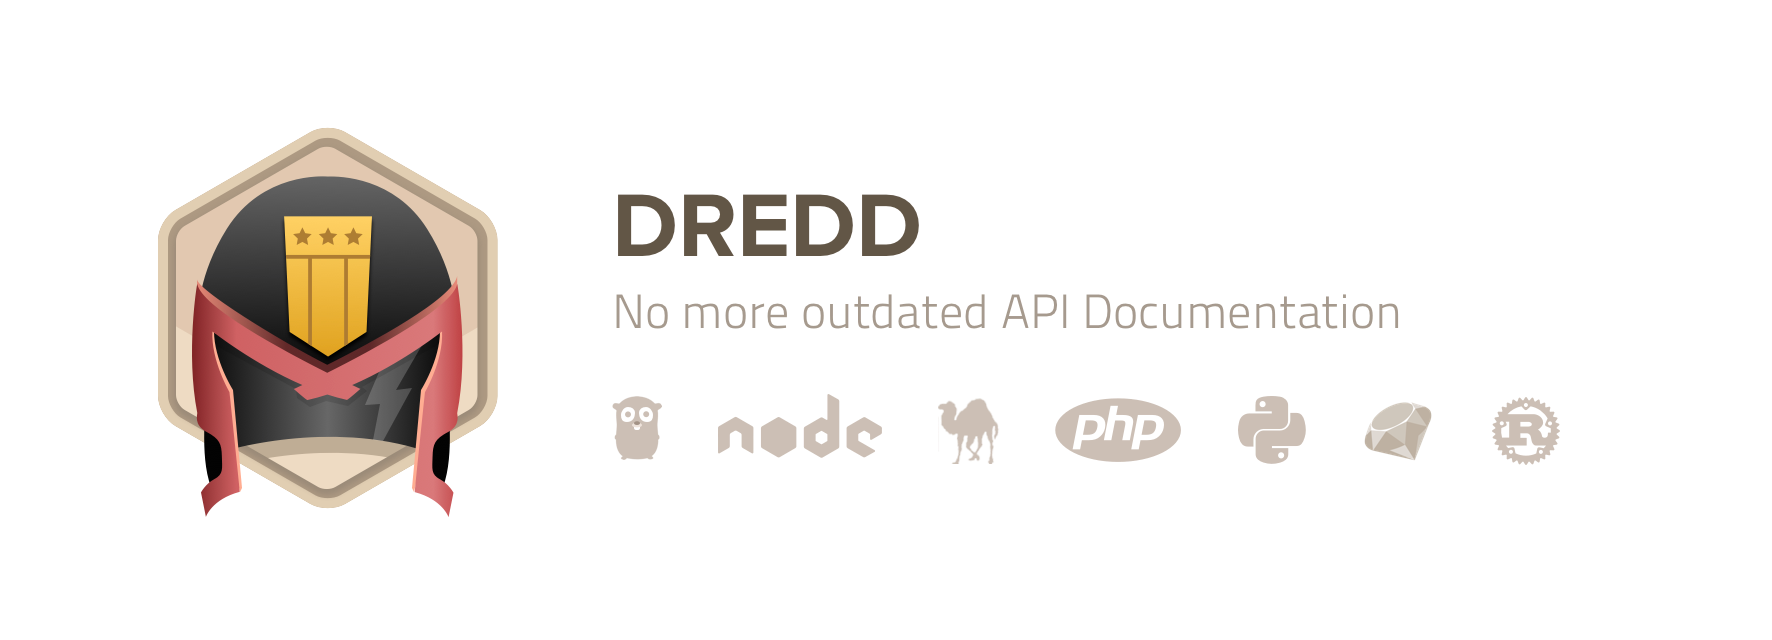 Dredd — HTTP API Testing Framework — Dredd 5.1.11 documentation